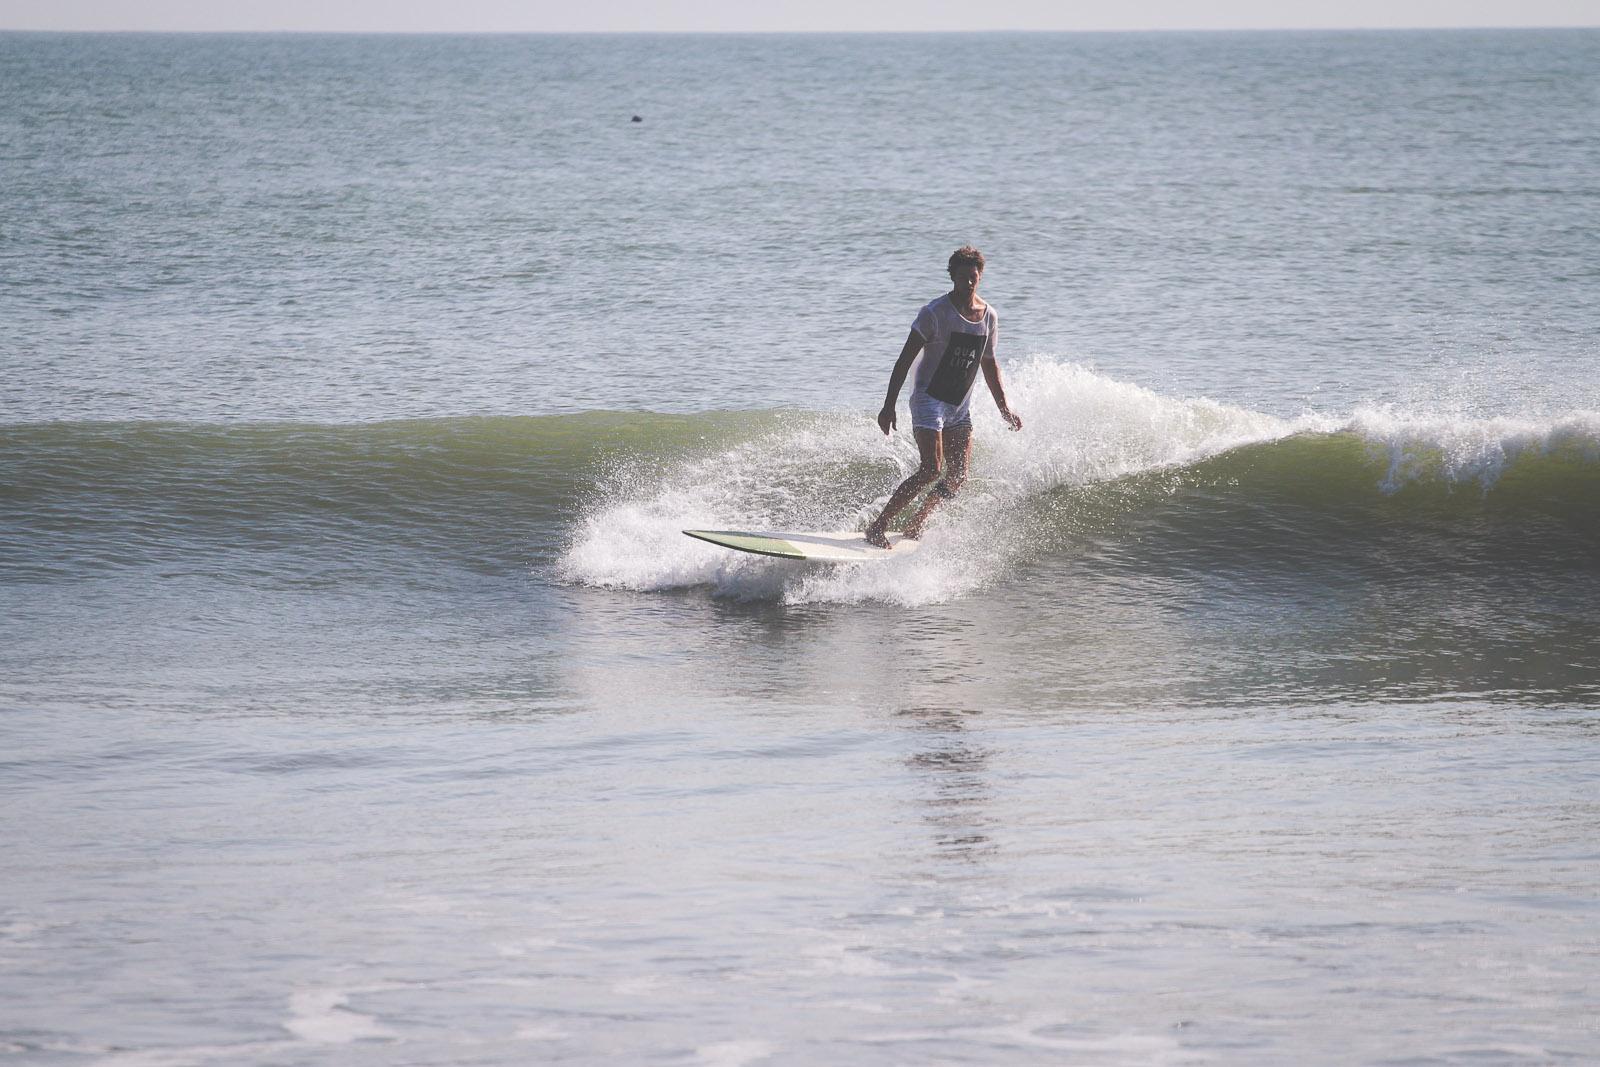 Sunshinestories-surf-travel-blog-IMG_9325